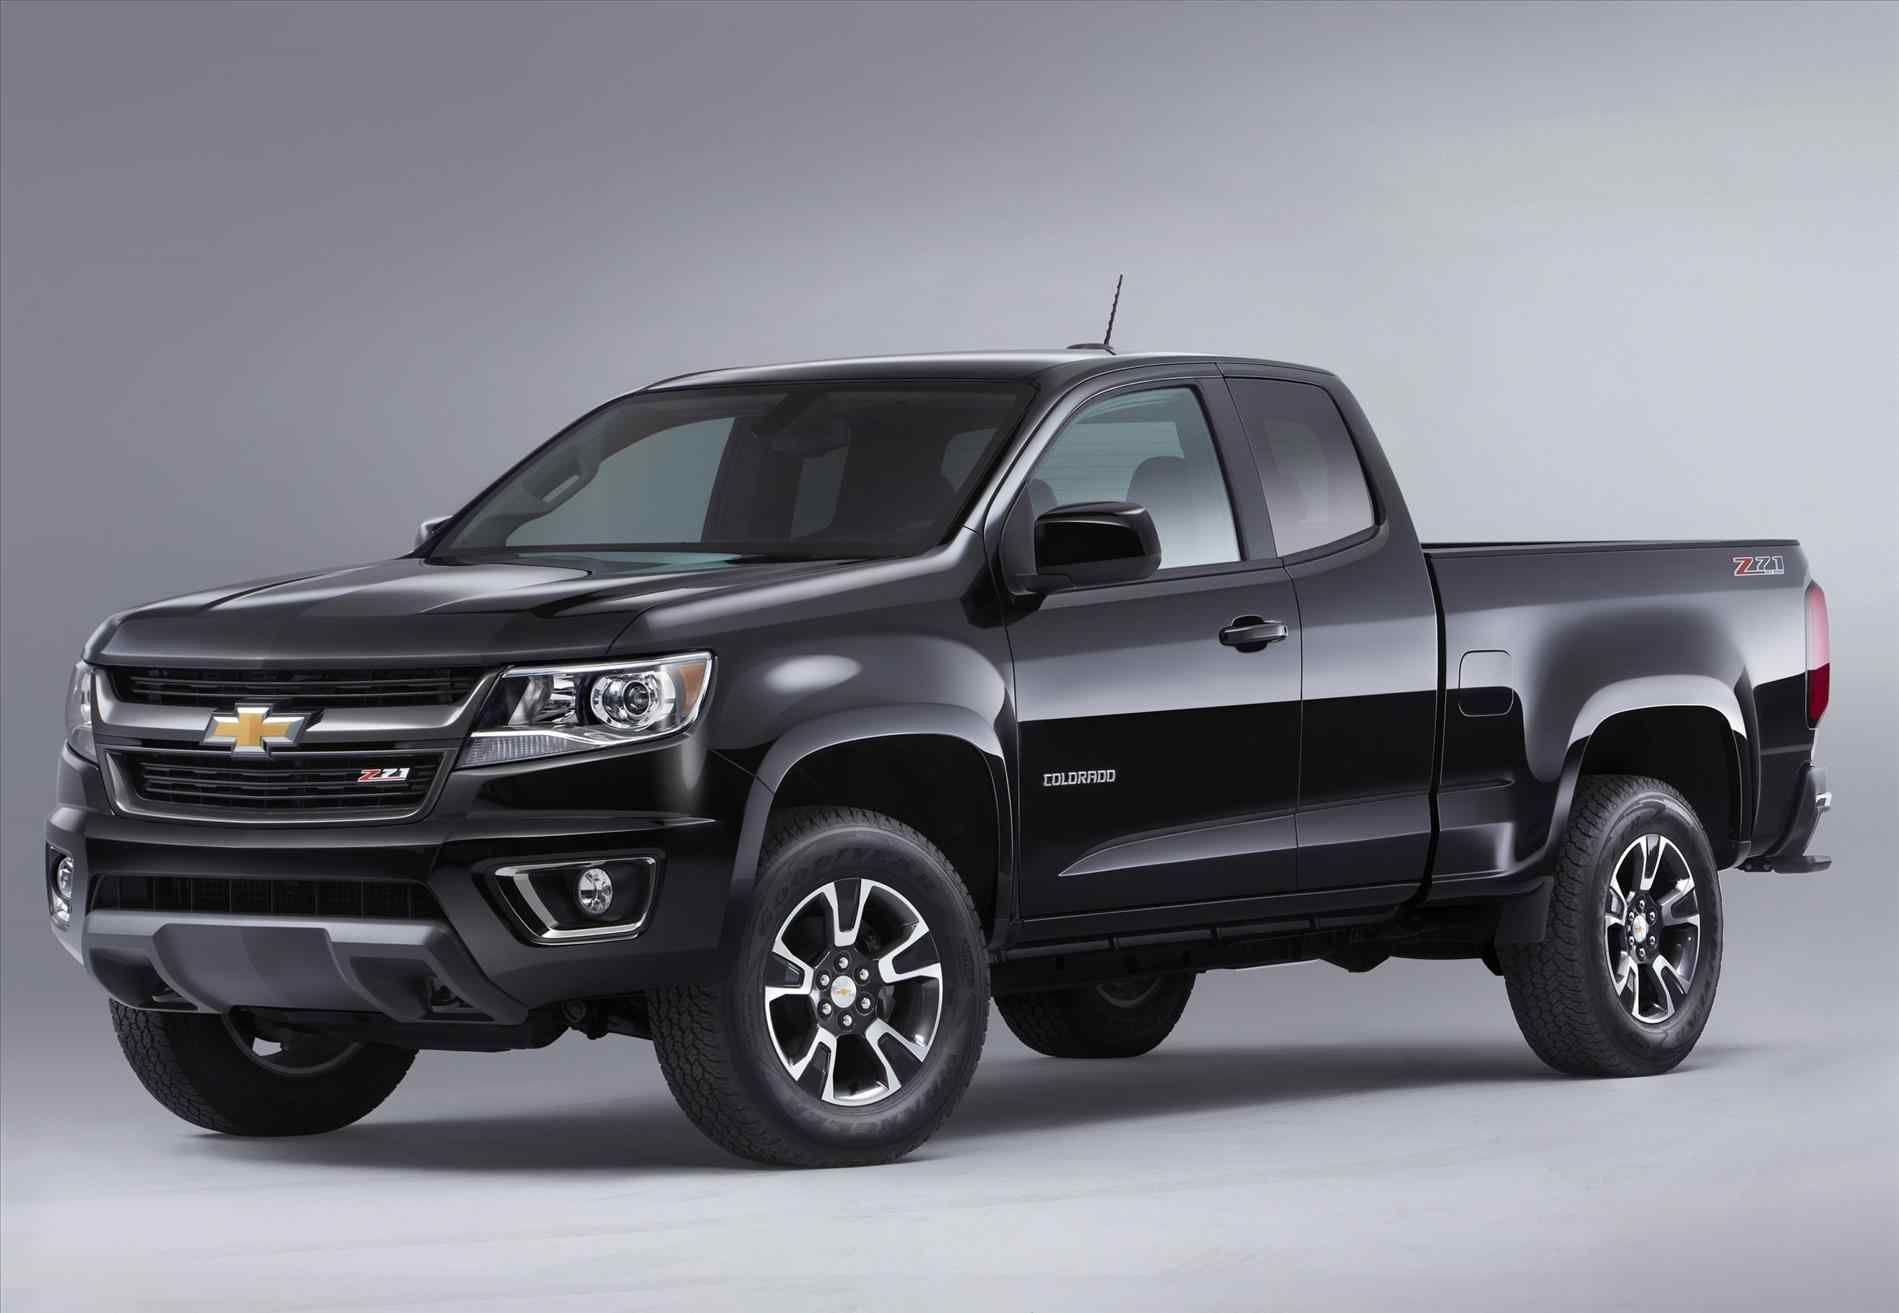 Pickup 2015 Hd Engineered To Make The Tough Jobs